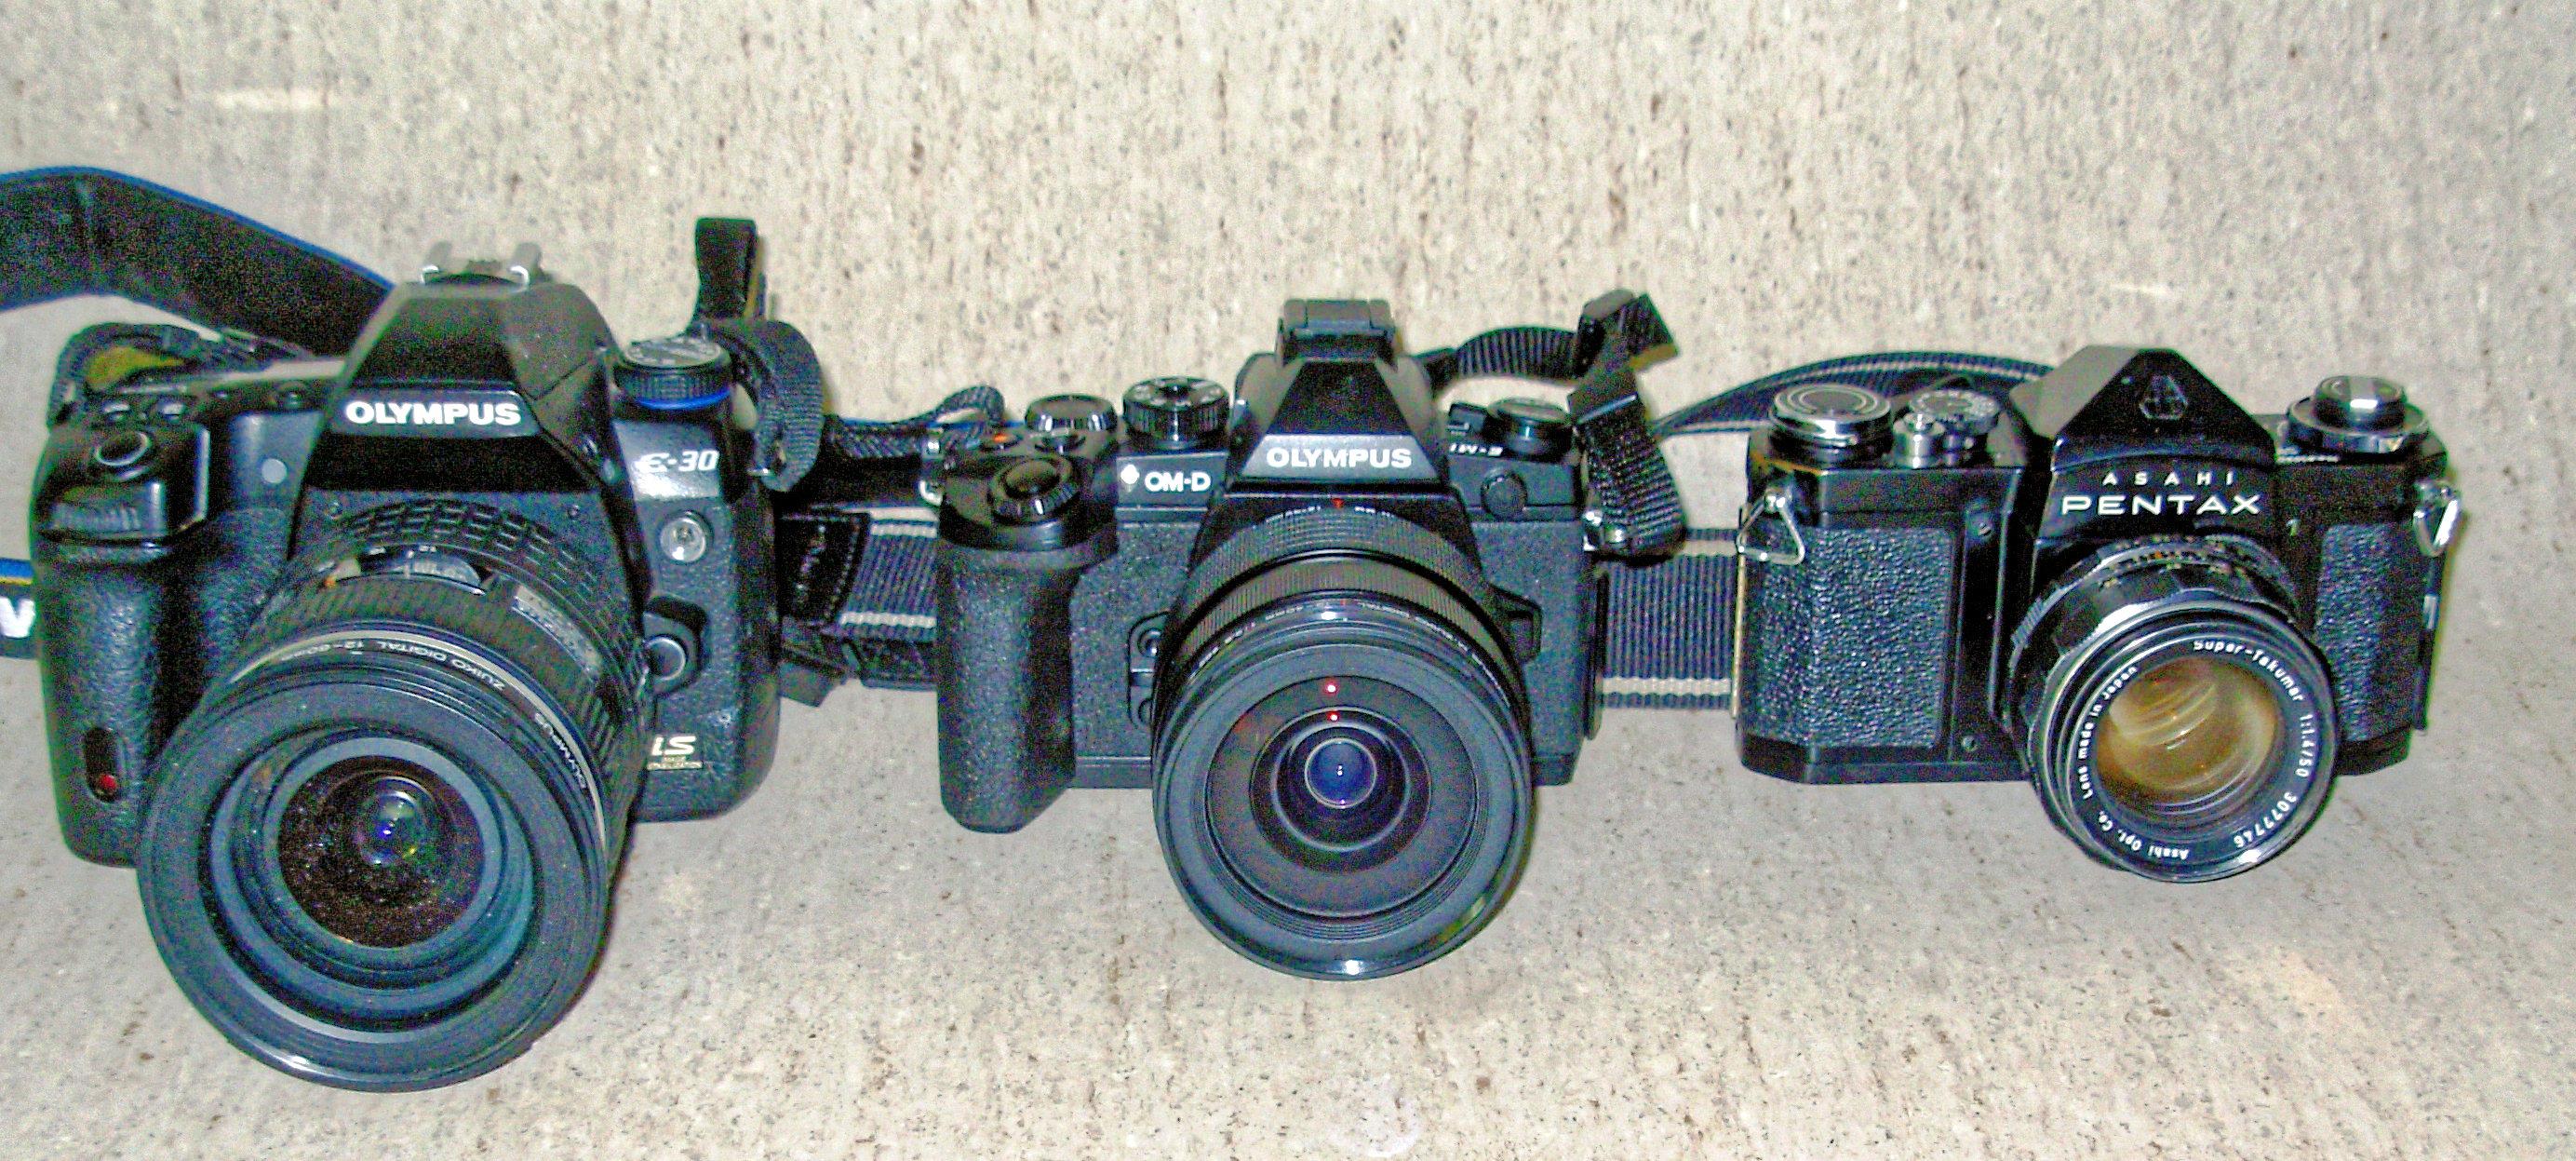 Compare-cameras-4.jpeg